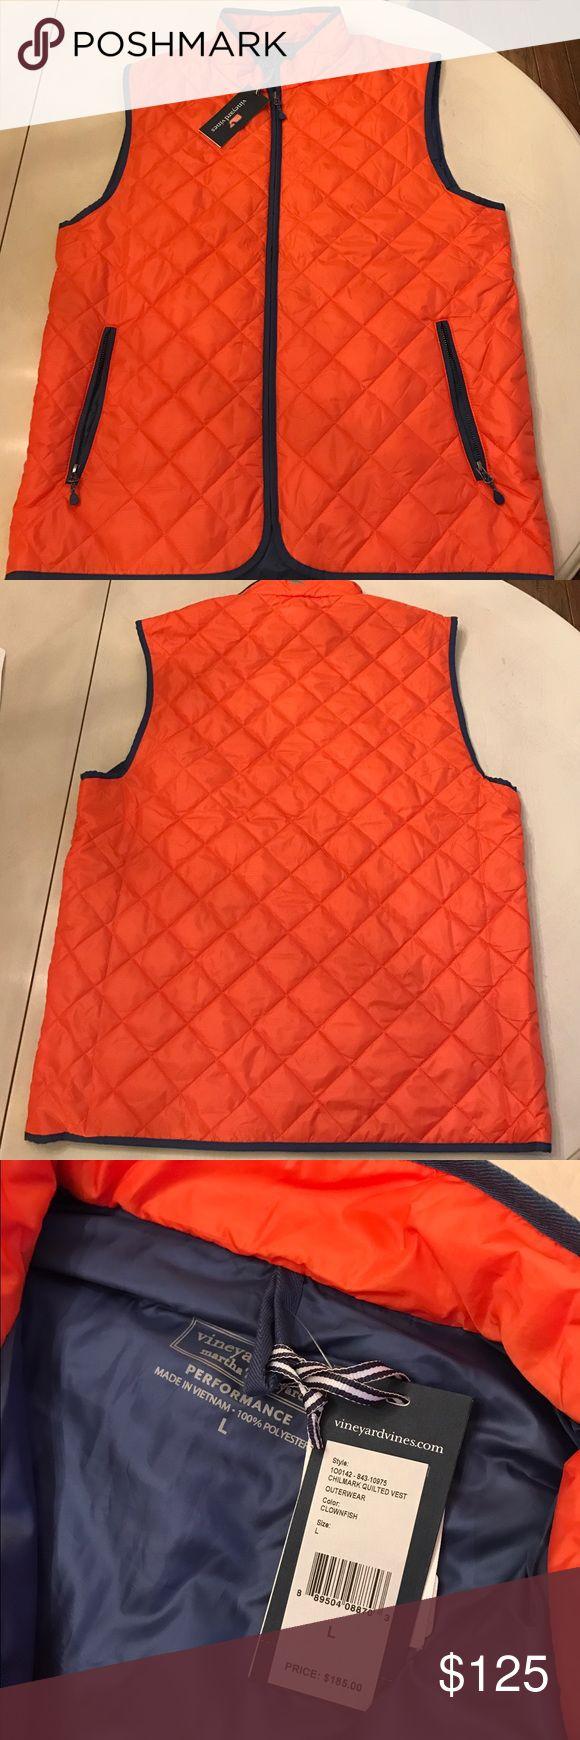 NWT Men's Vineyard Vines orange puffer vest $185 Brand new with tags men's hunter orange warm vest.  Fashionable when you hunt ! Vineyard Vines Jackets & Coats Vests